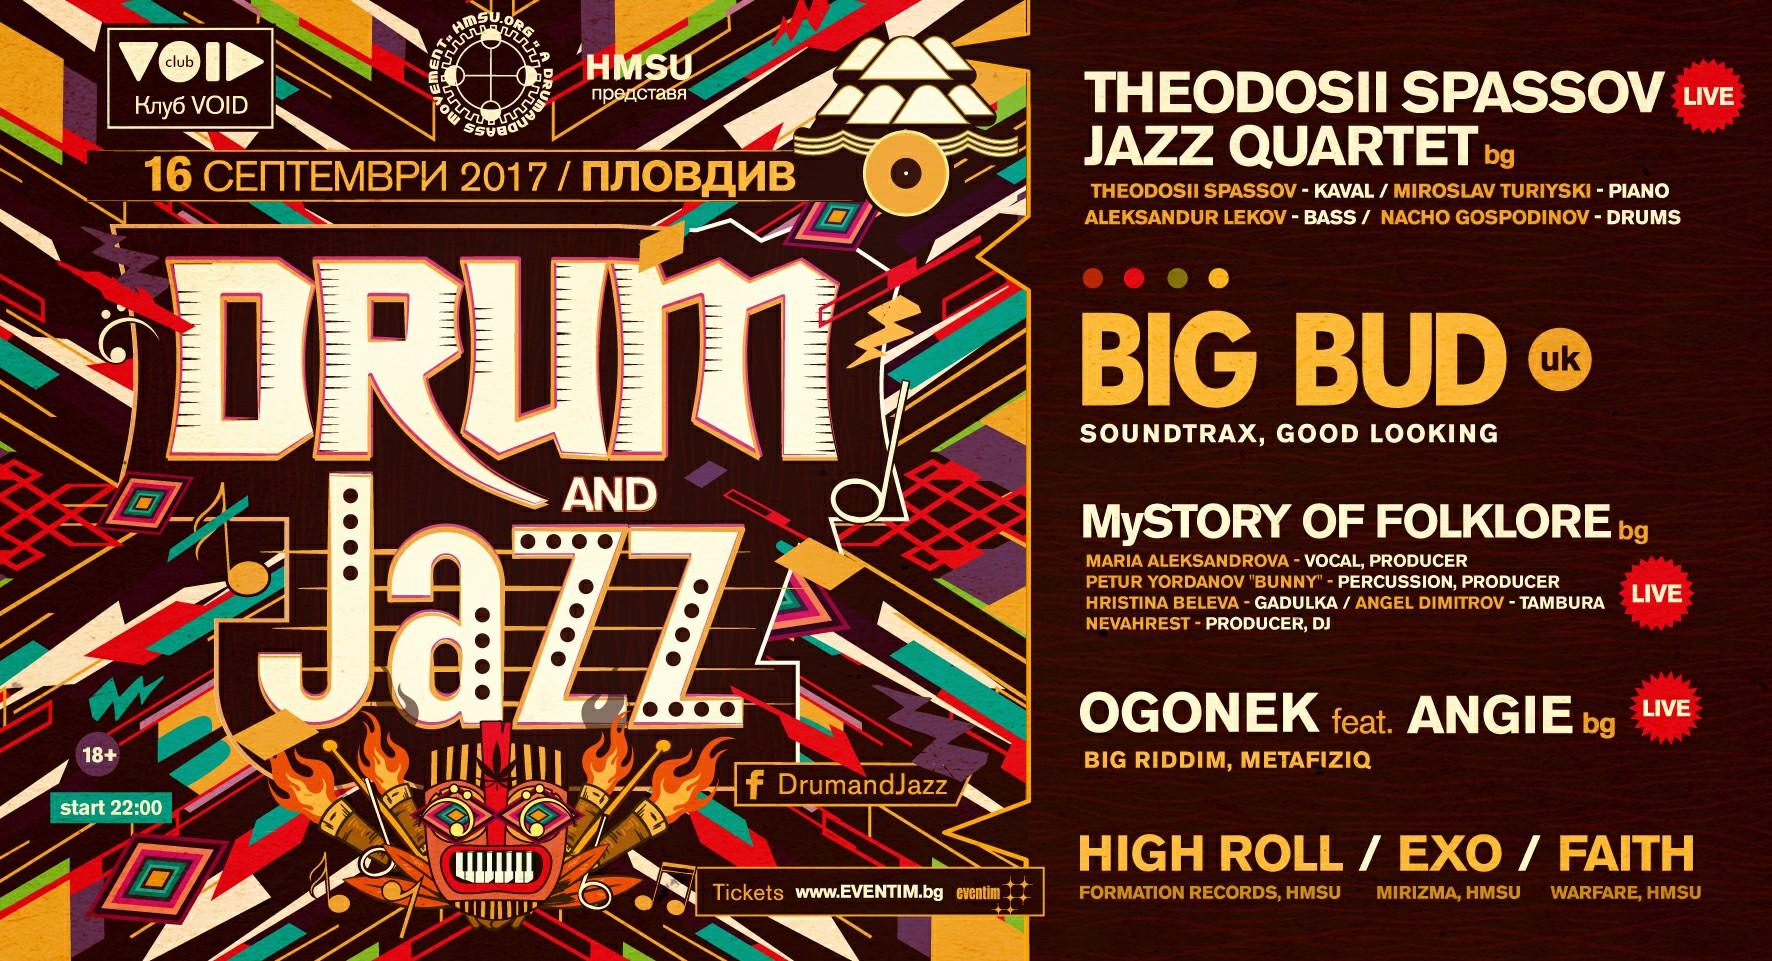 Drum and Jazz